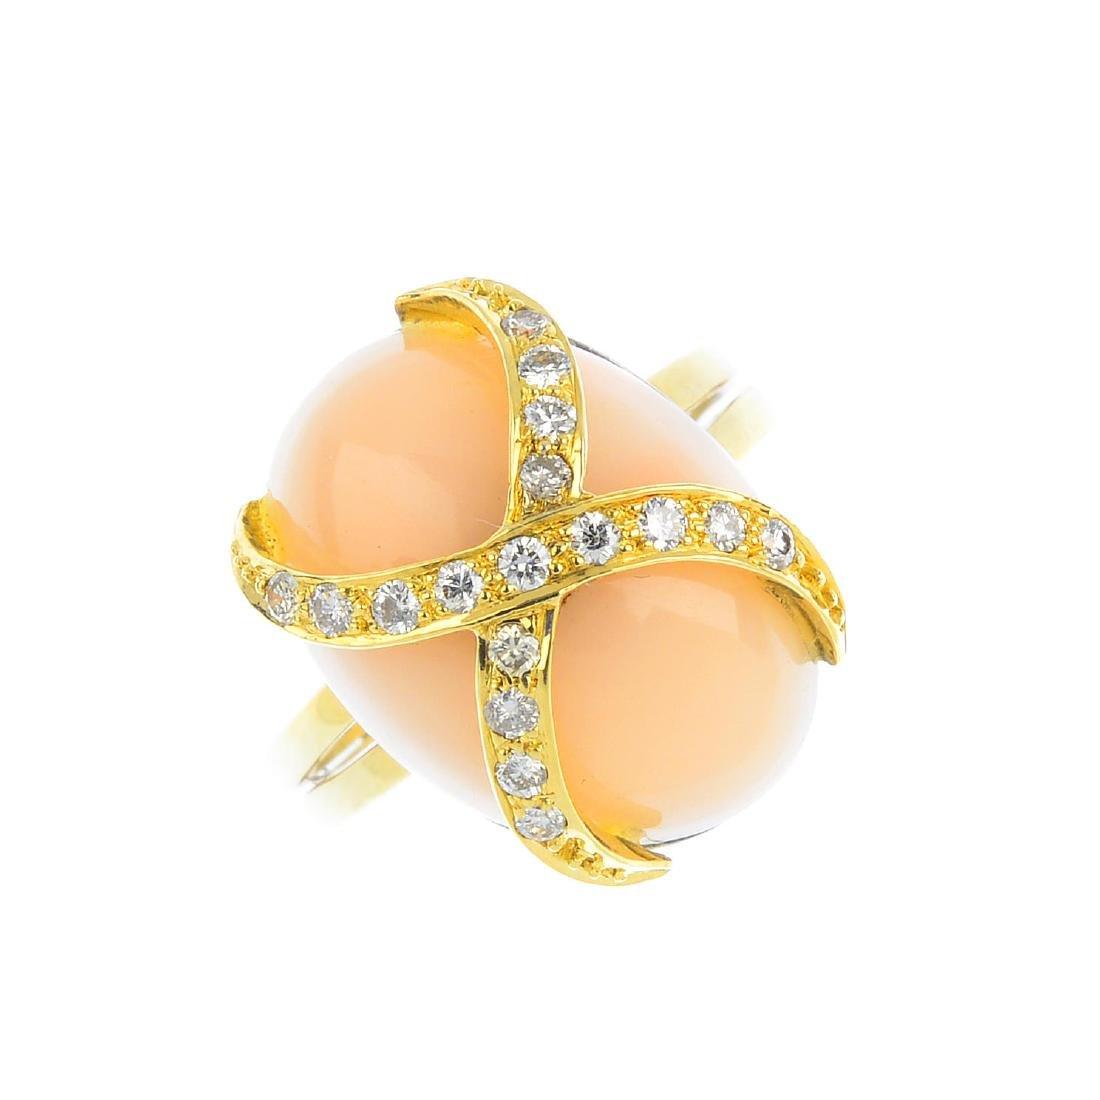 A coral and diamond ring. The brilliant-cut diamond